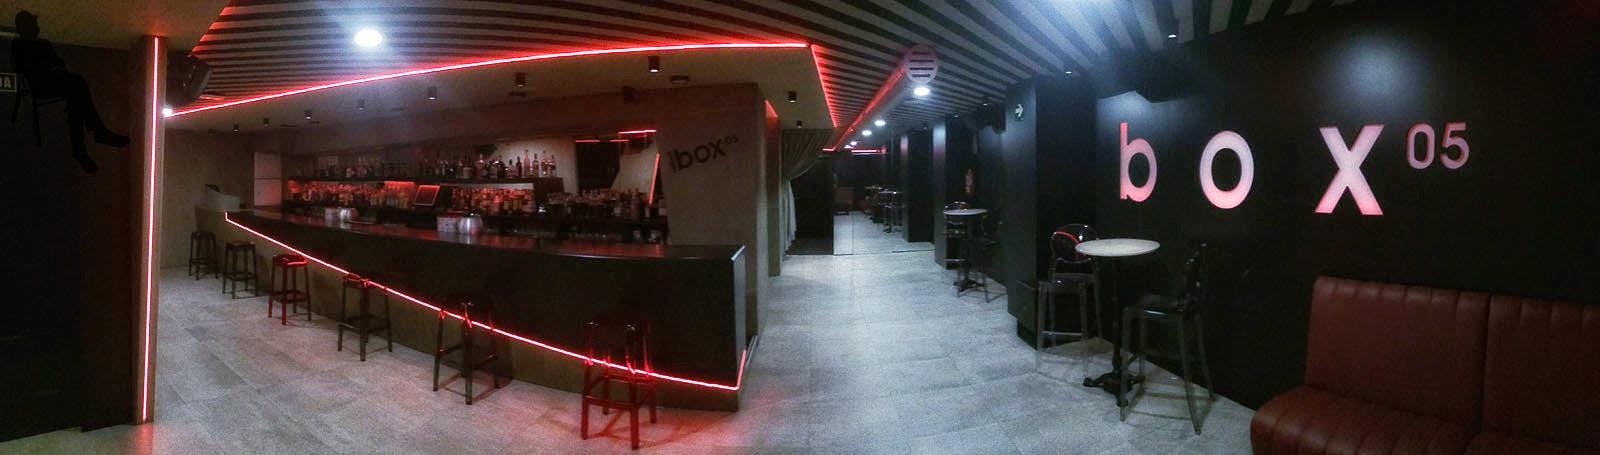 César Fuentes Zatón. Diseño de interiores box05. Ferrol A Coruña